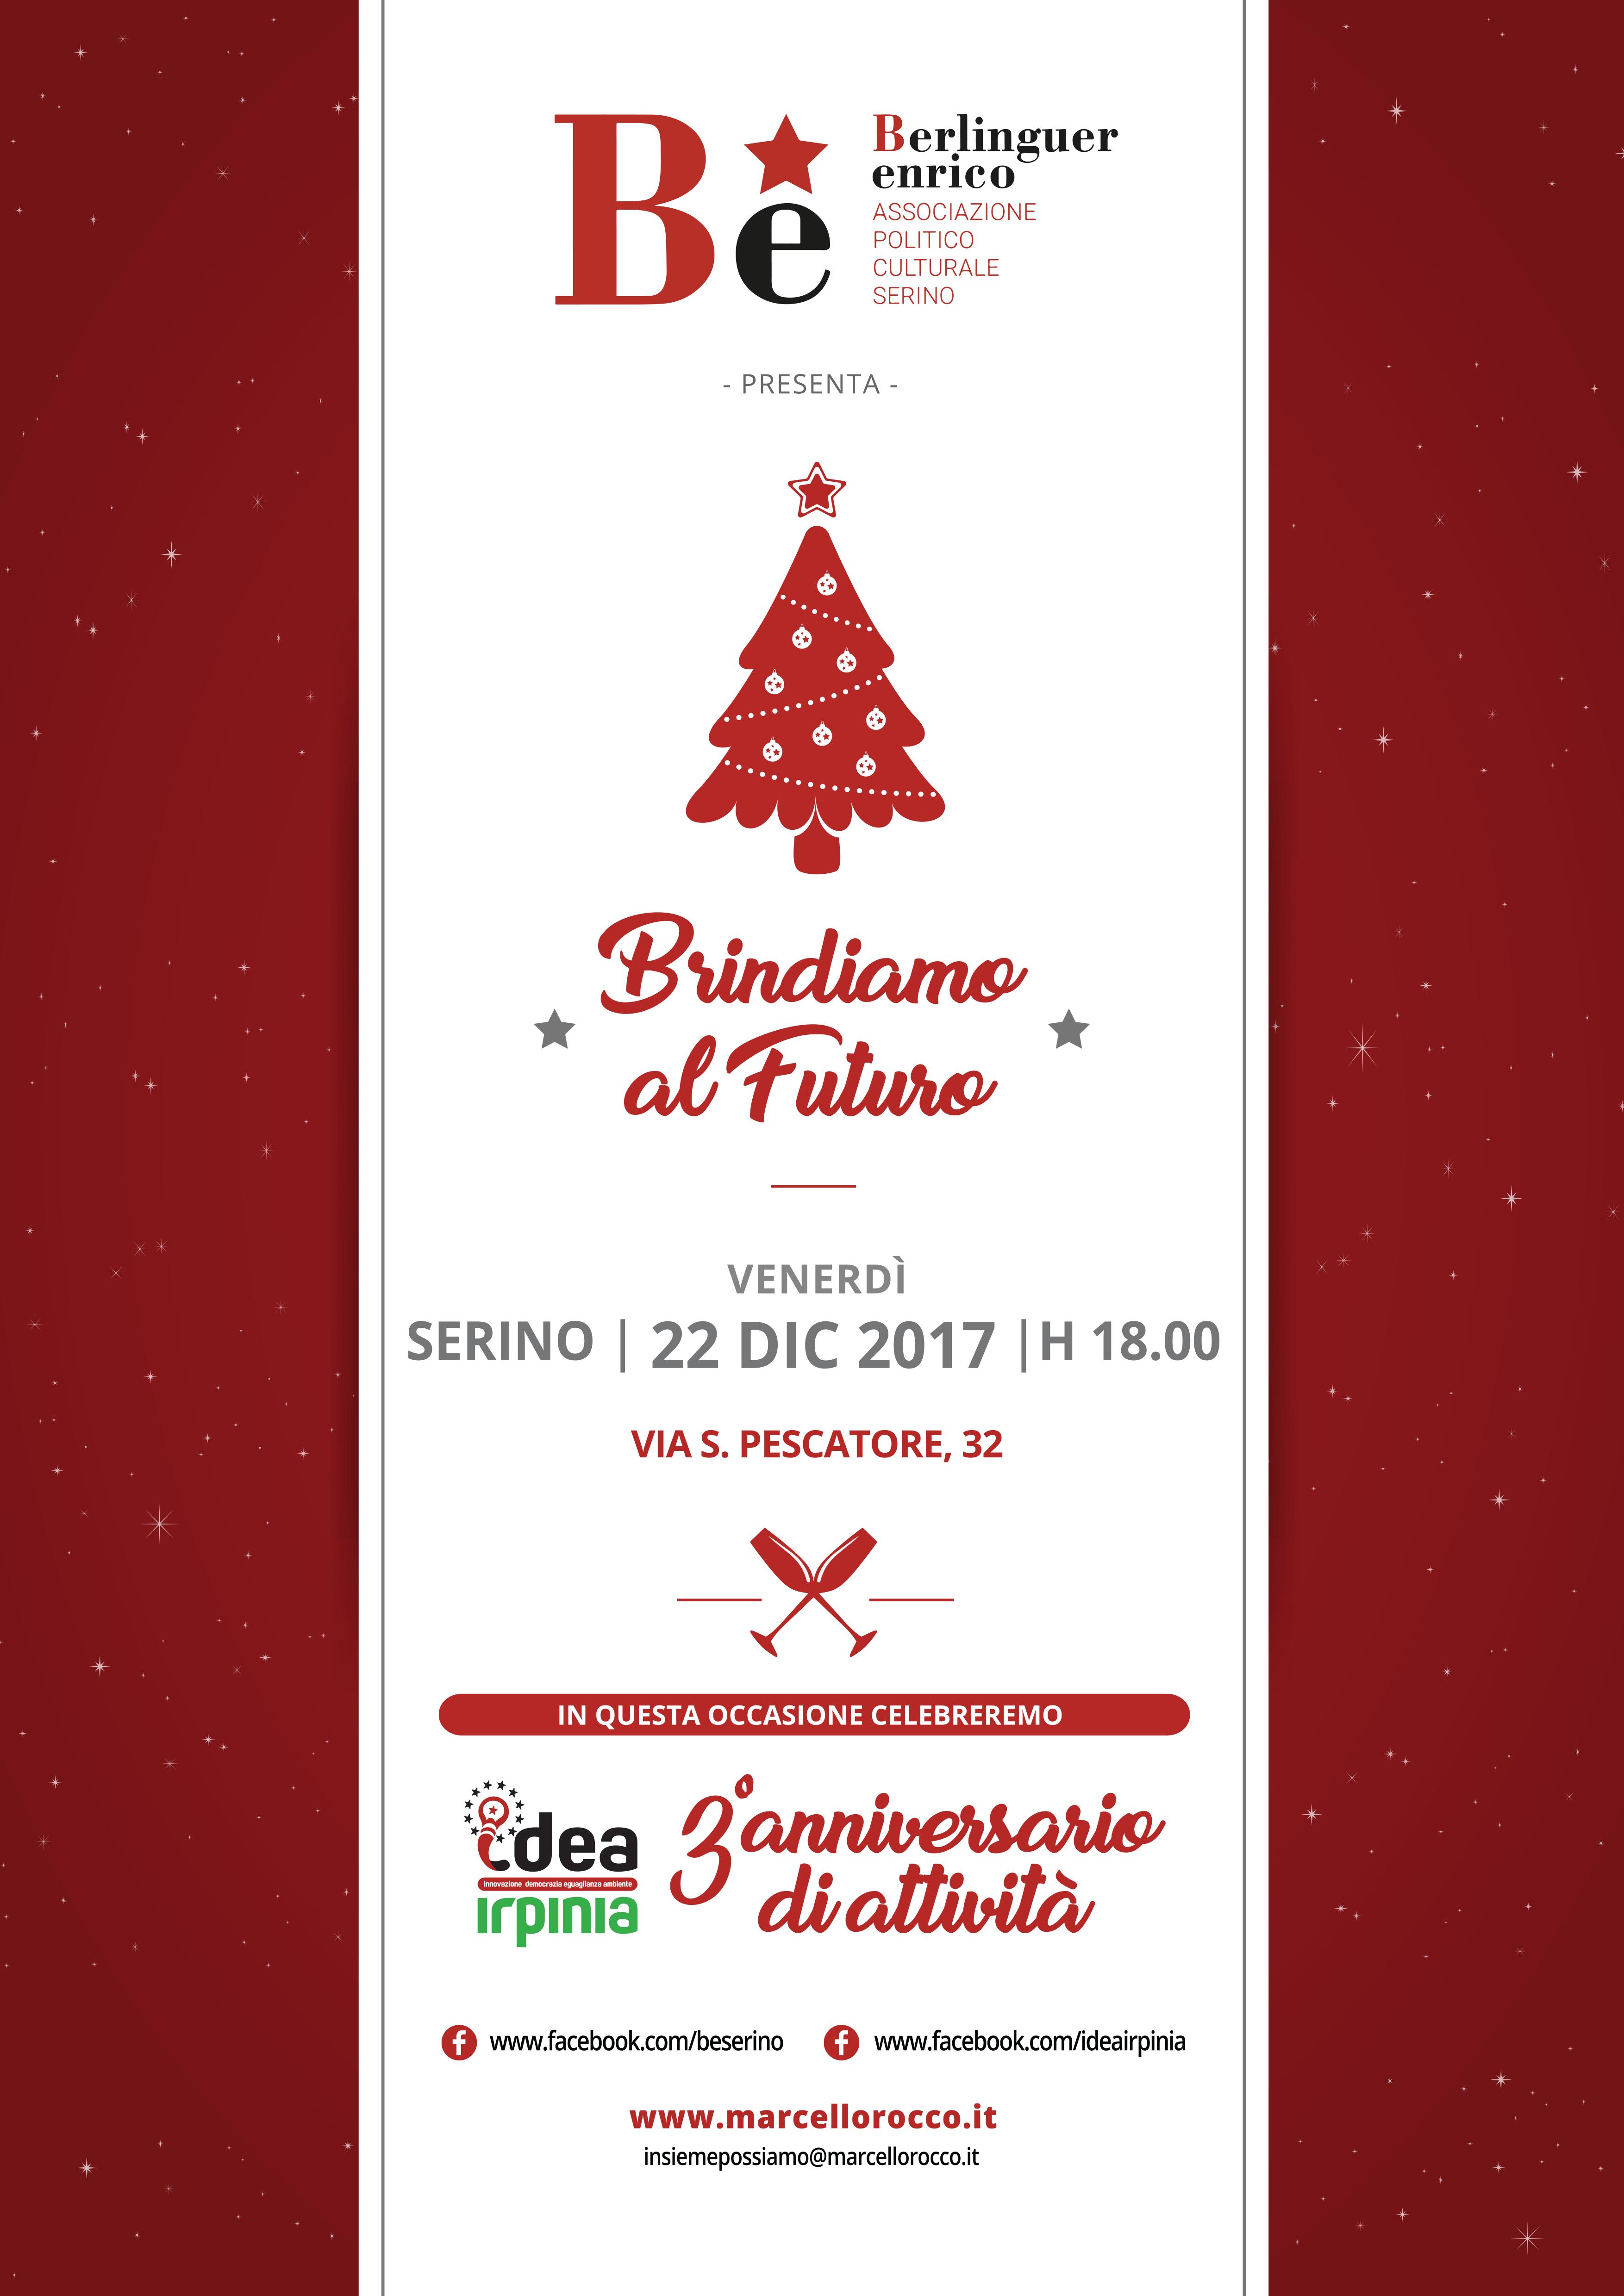 Locandina JPEG Brindiamo al Futuro 22 Dic 2017 - Associaizoni Be IDEA Irpinia